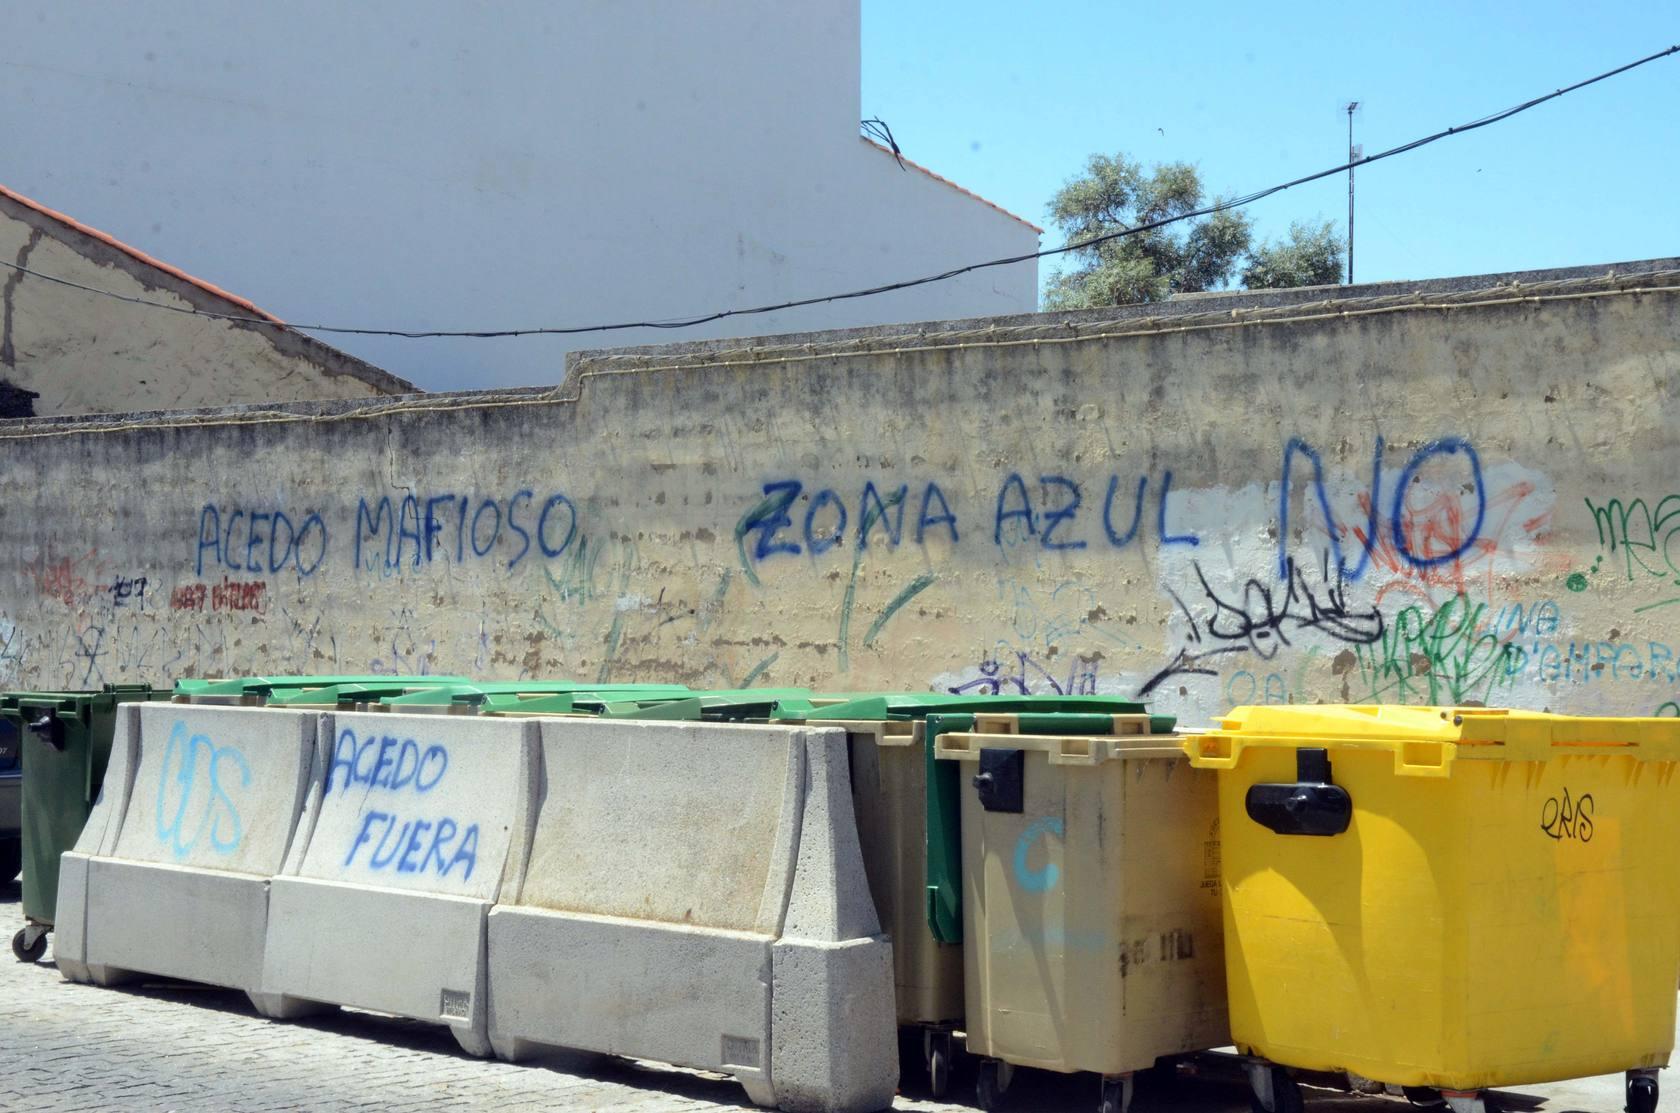 Pintadas contra la zona azul en Mérida